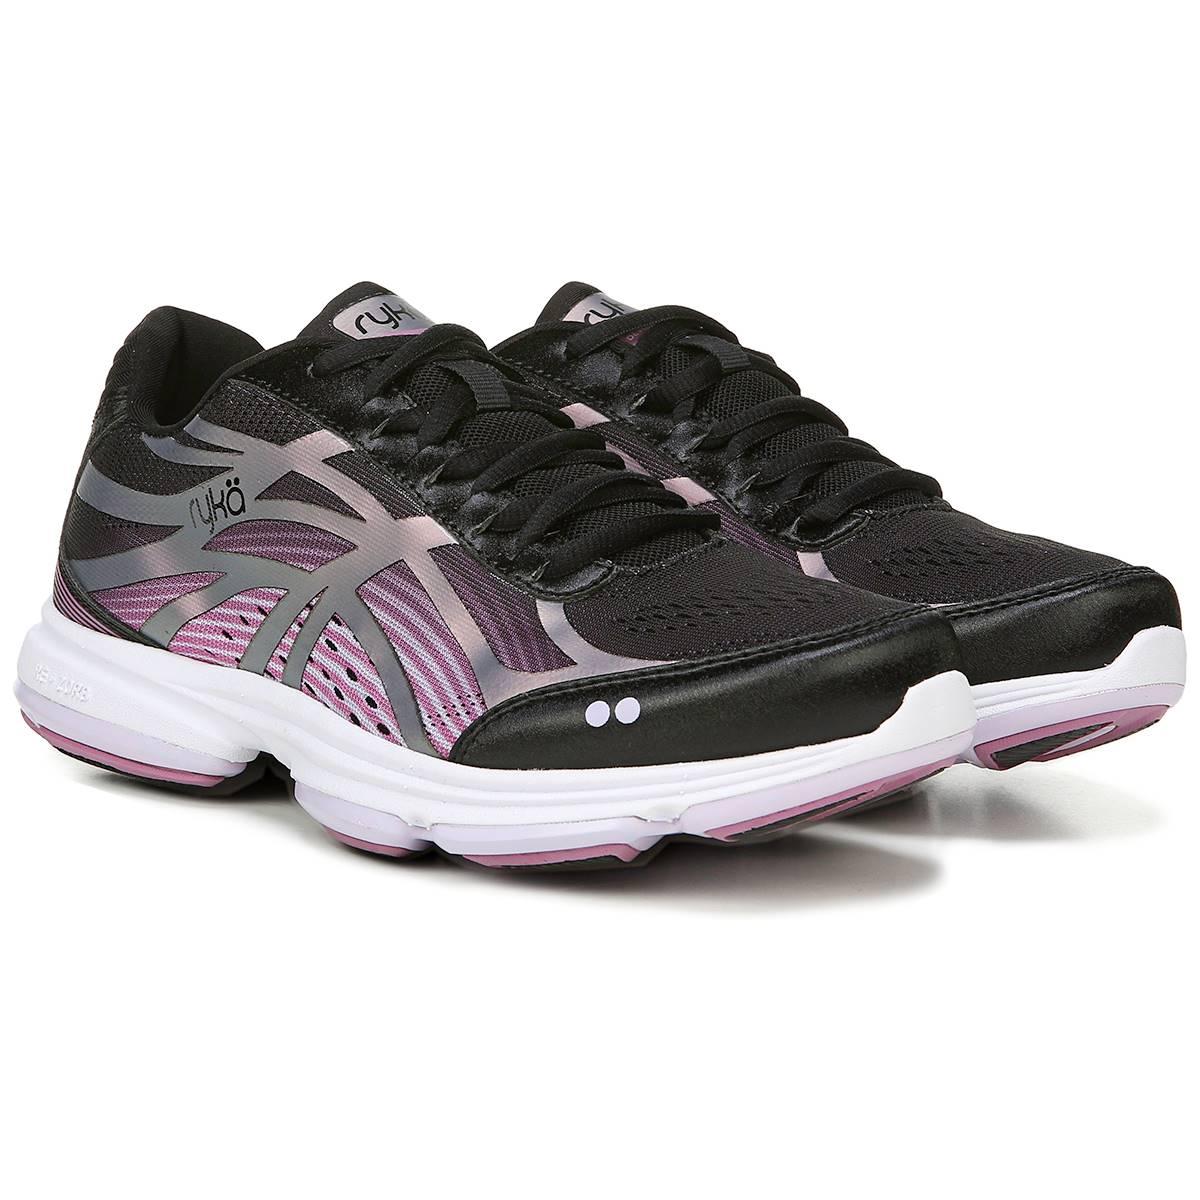 Ryka-Devotion-3 +80 Most Inspiring Workout Shoes Ideas for Women